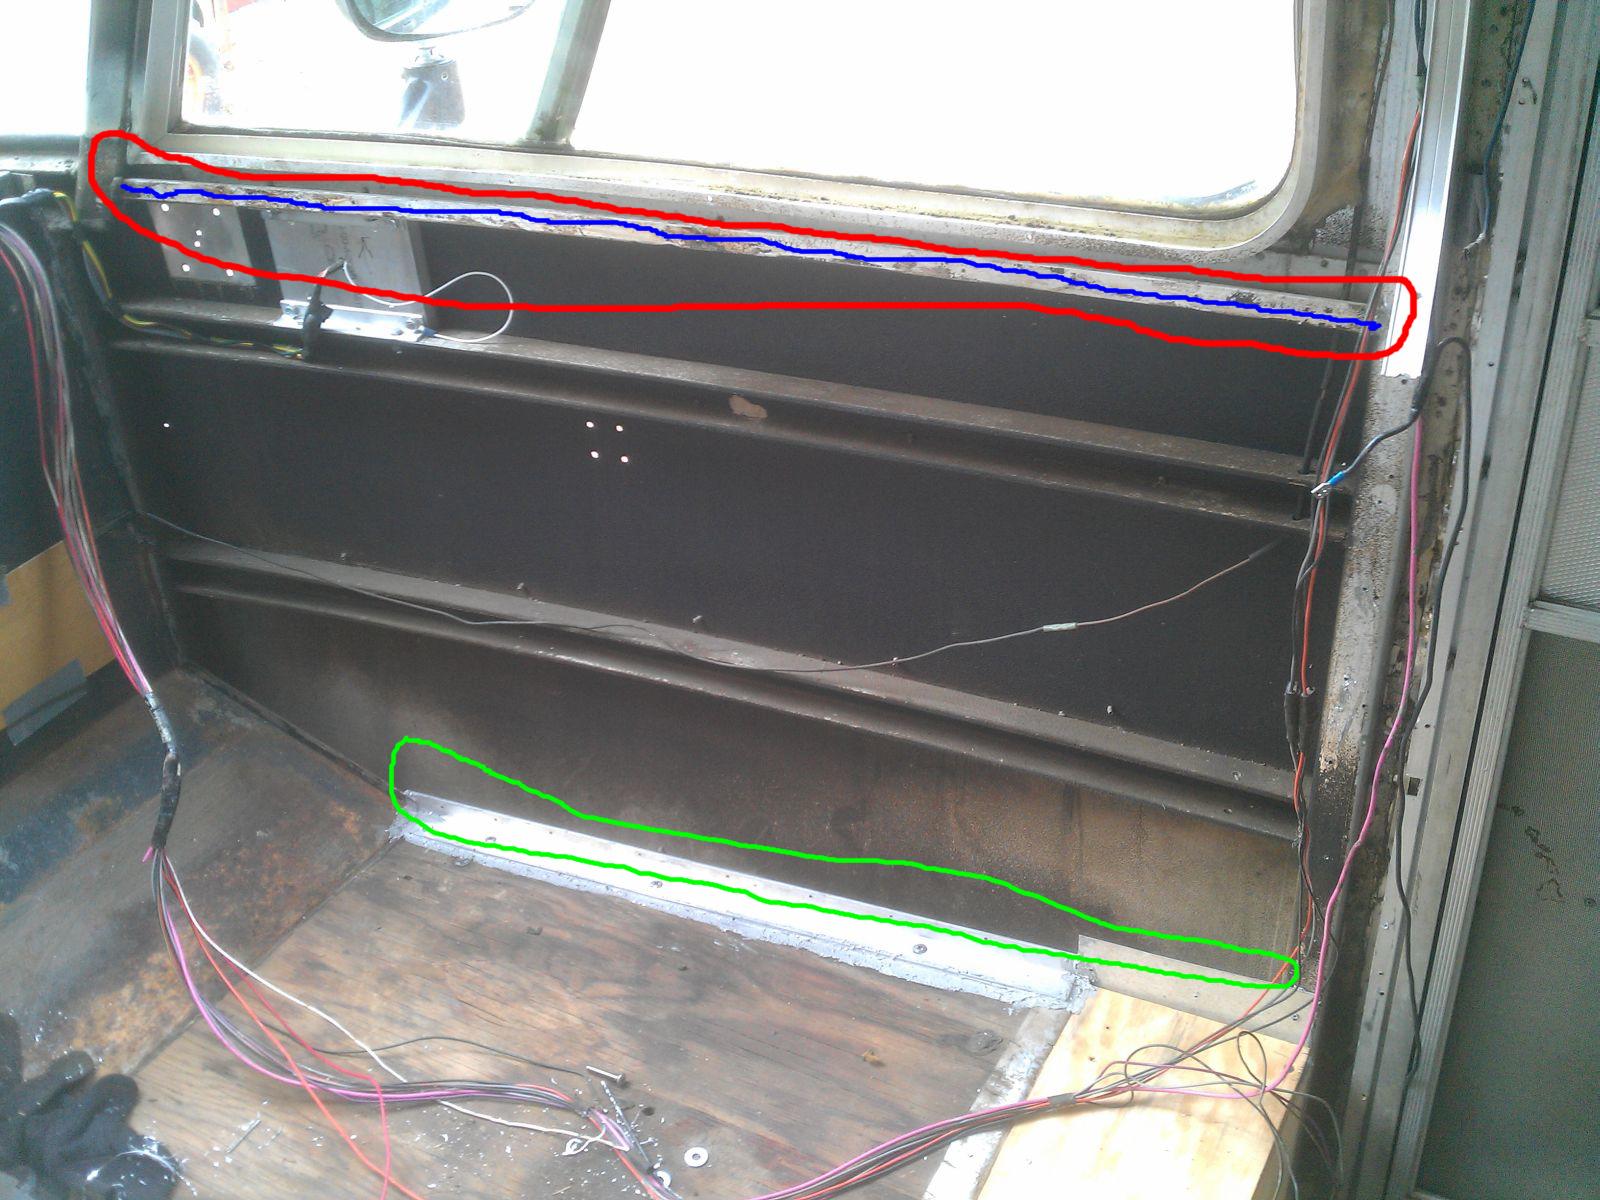 Click image for larger version  Name:74-argosy-rh-cockpit-inner-framework.jpg Views:108 Size:1.14 MB ID:194655